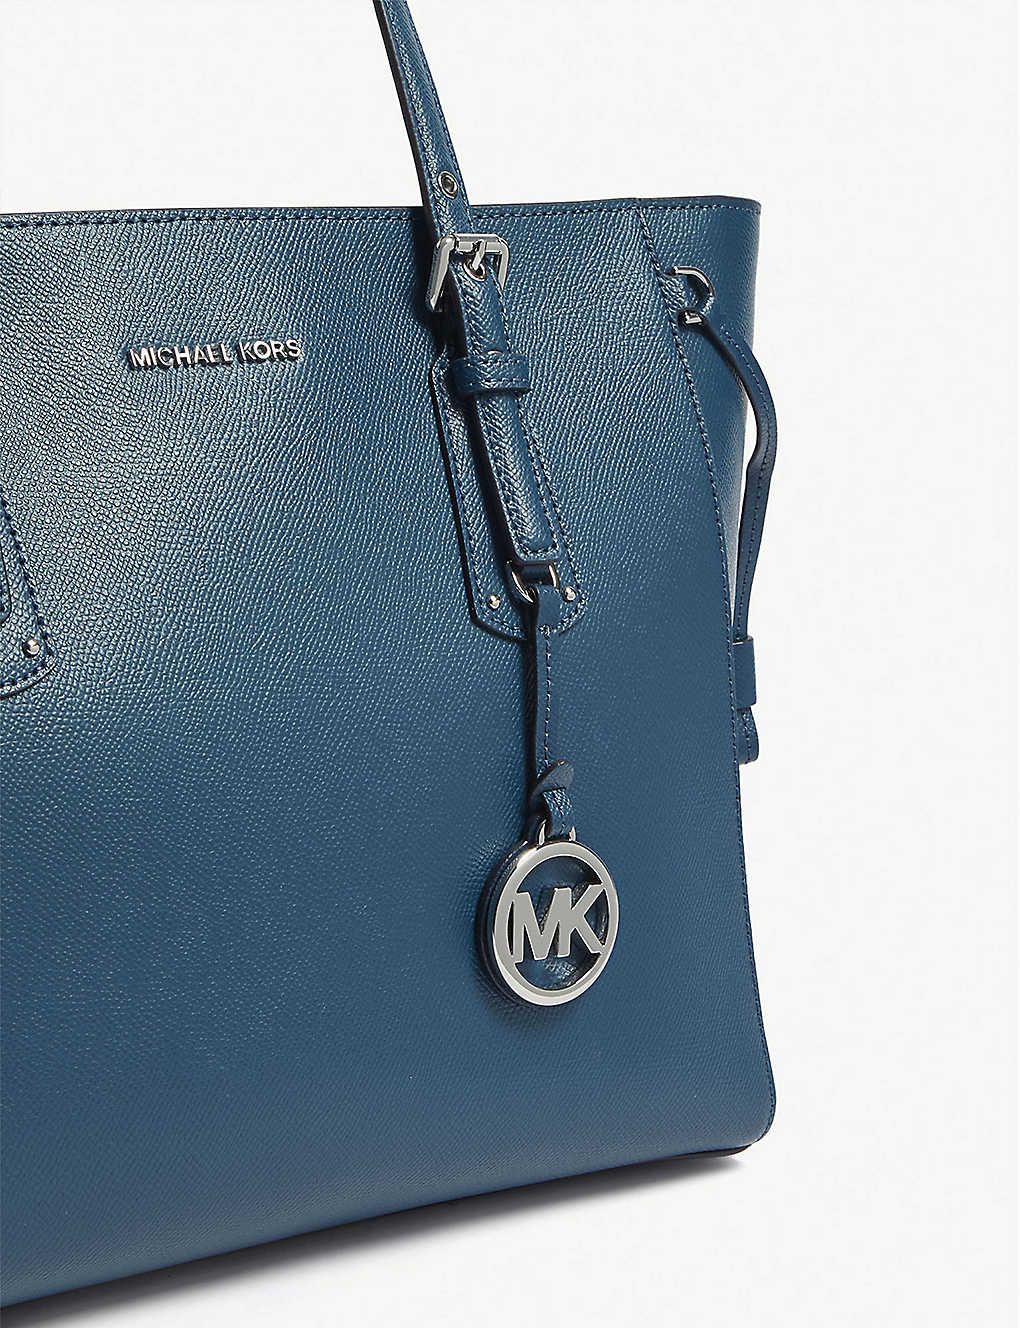 cdbebb70555123 MICHAEL MICHAEL KORS - Voyager medium leather tote | Selfridges.com